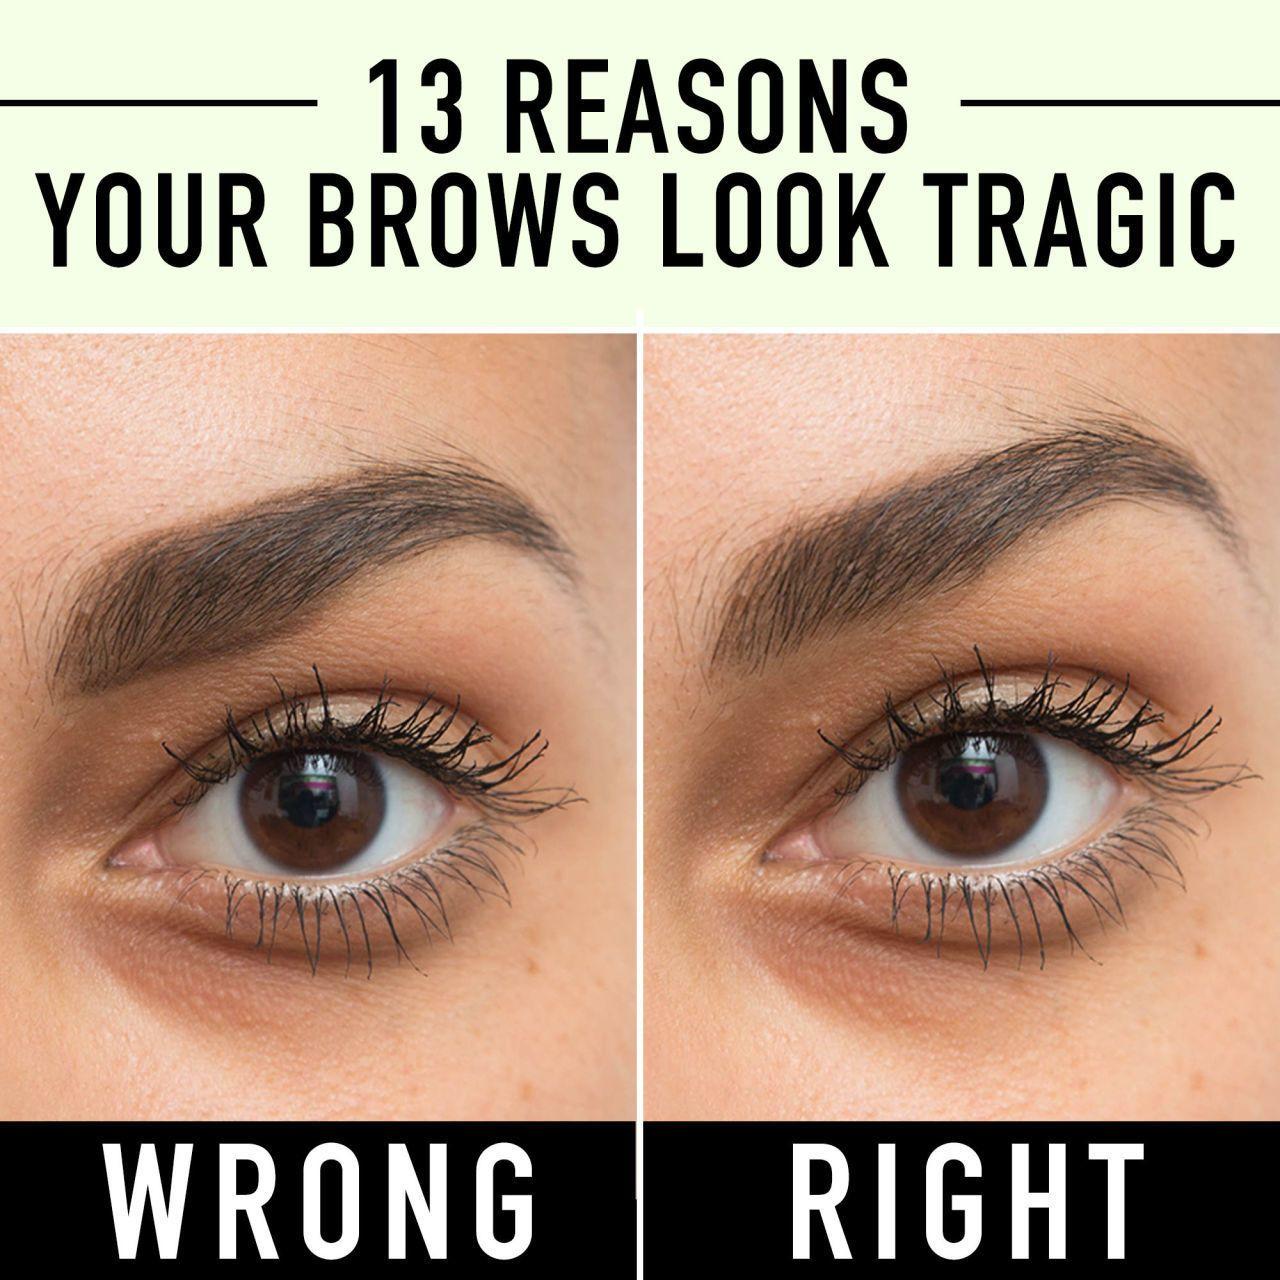 13 Reasons Your Eyebrows Look Tragic | Eyebrow and Makeup